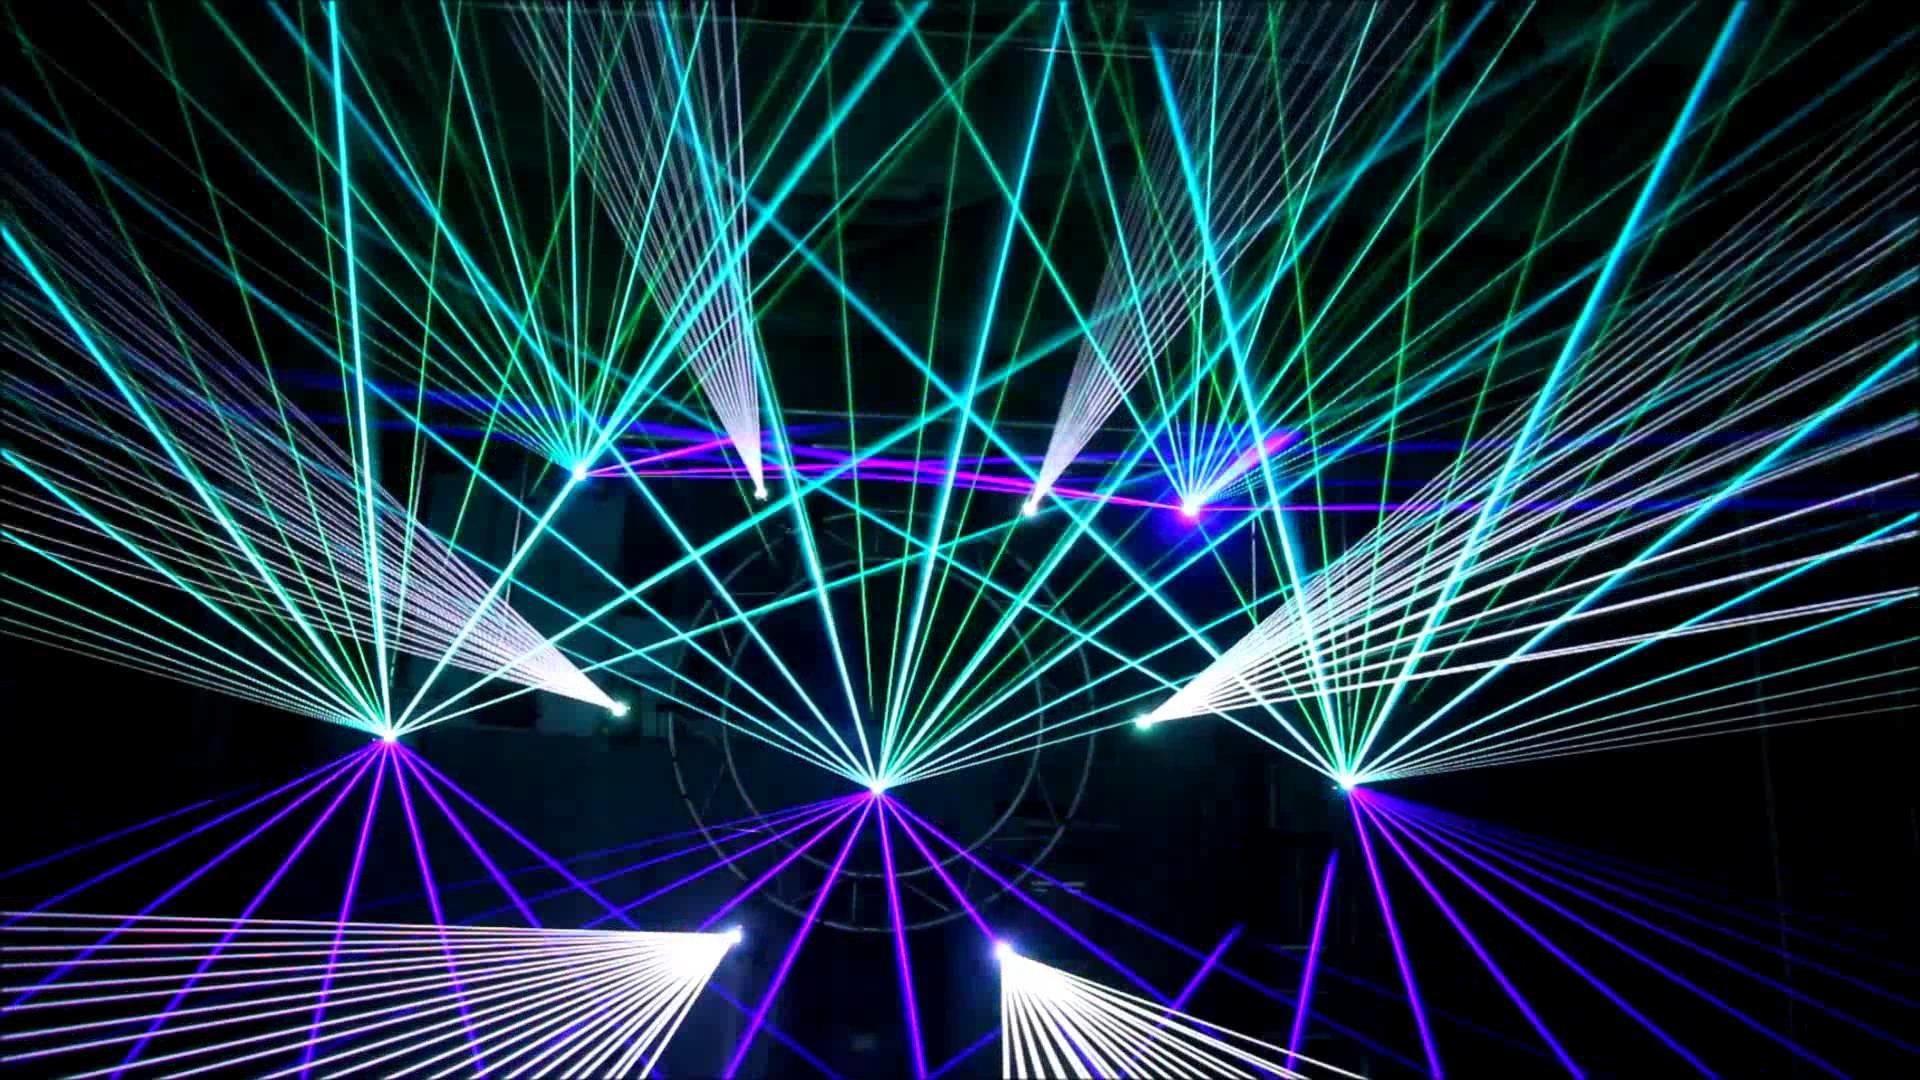 tomorrowland 2018 laser show hd wallpaper 183��